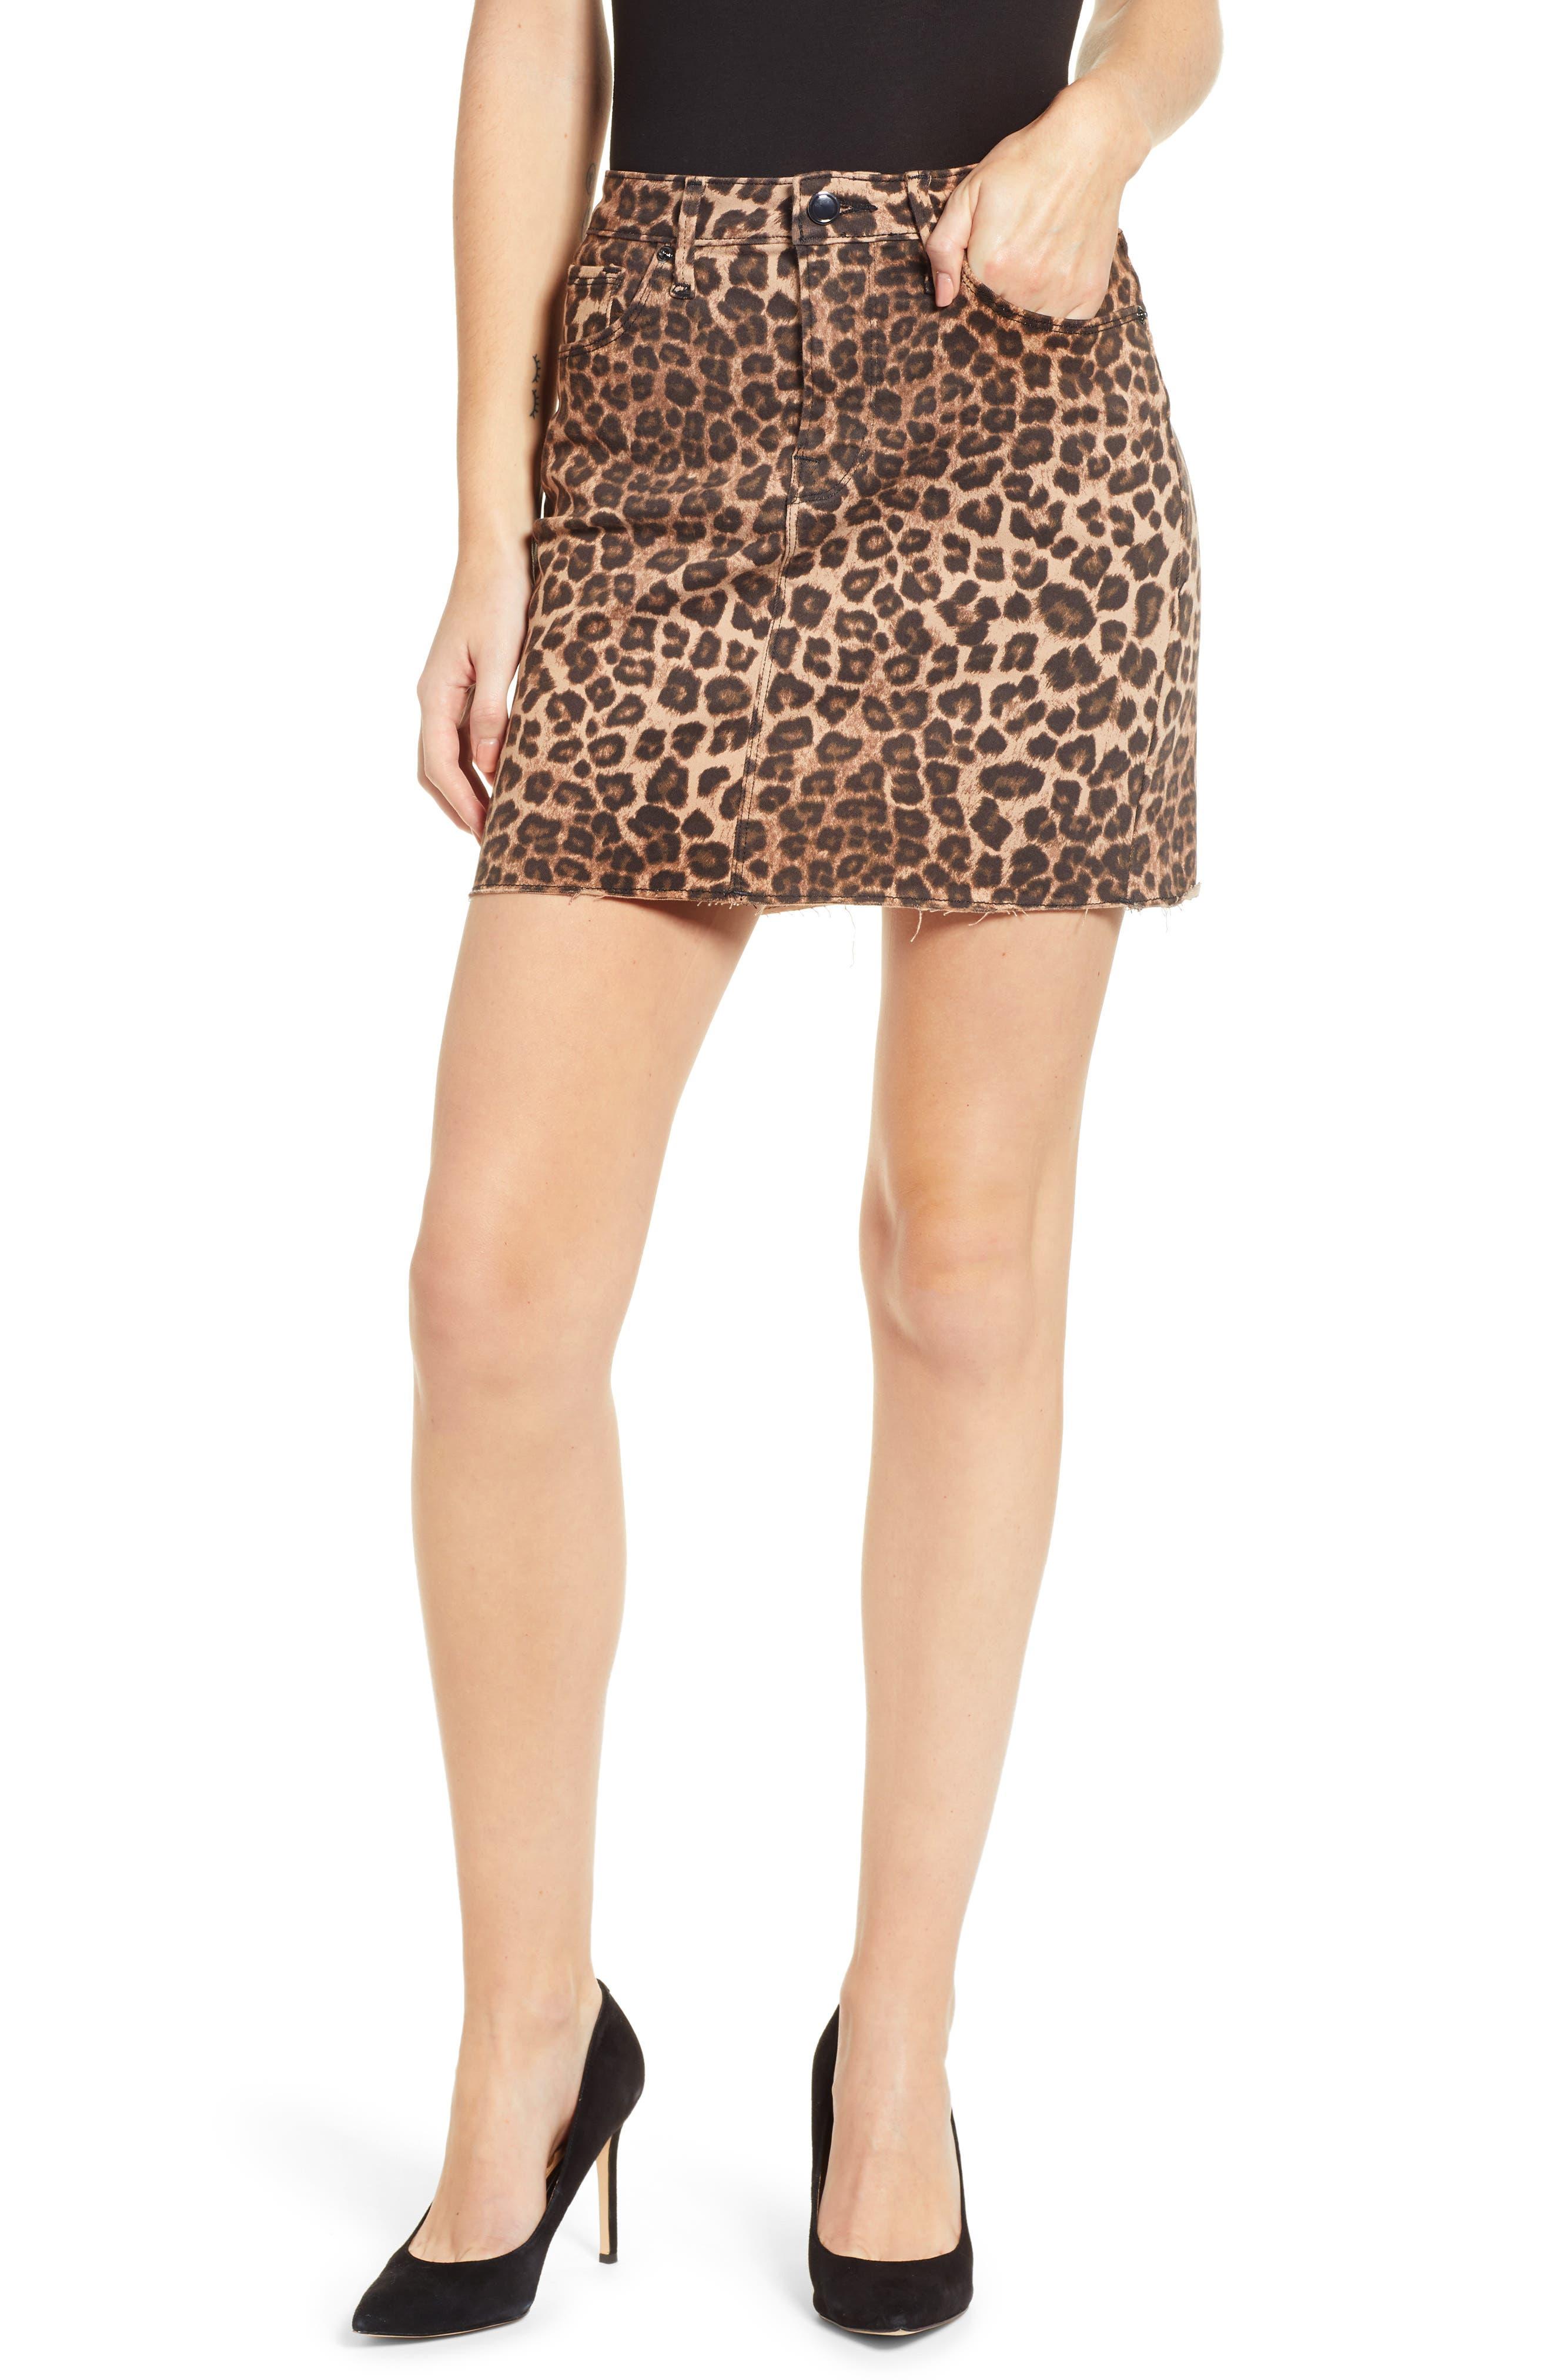 GOOD AMERICAN Cheetah Print Raw Edge Miniskirt, Main, color, CHEETAH001